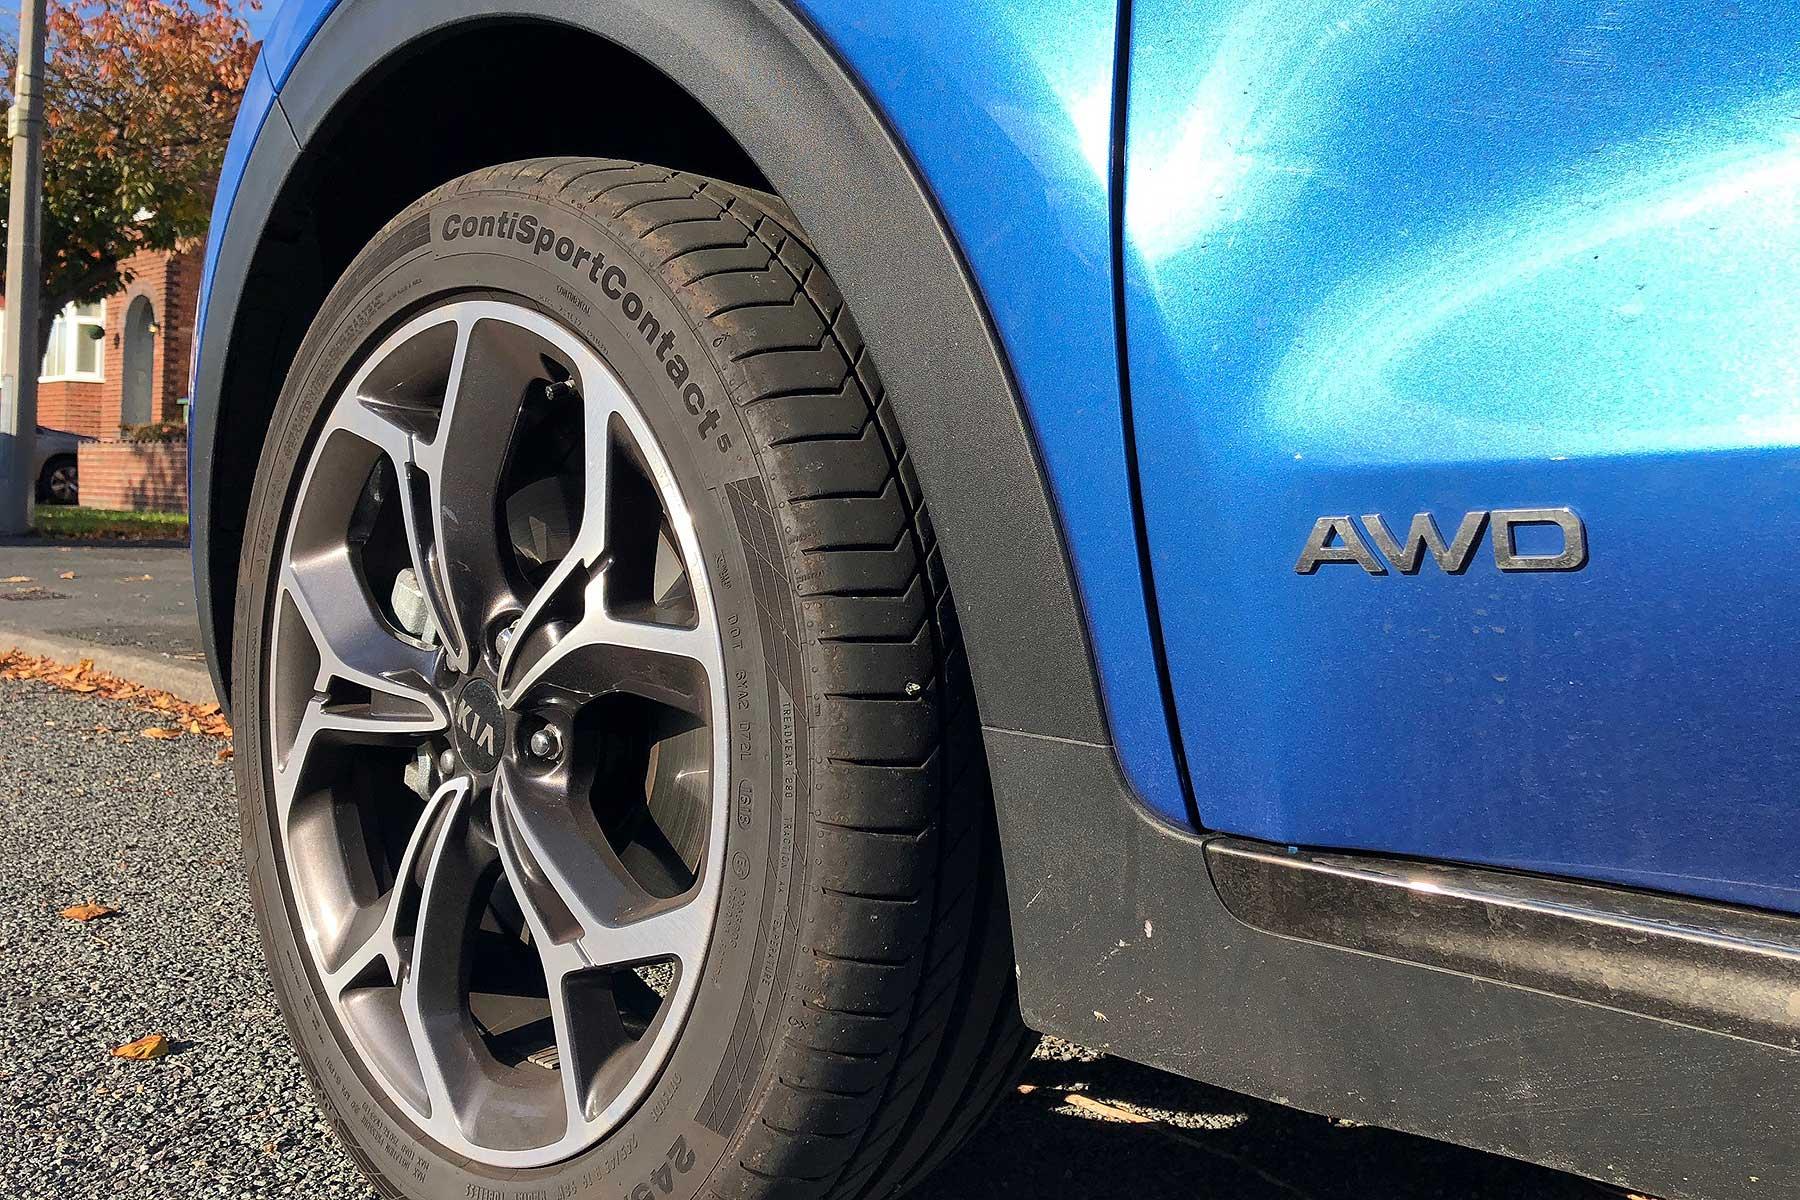 Kia Sportage GT-Line S 2.0 CRDi 184 48V long-term test